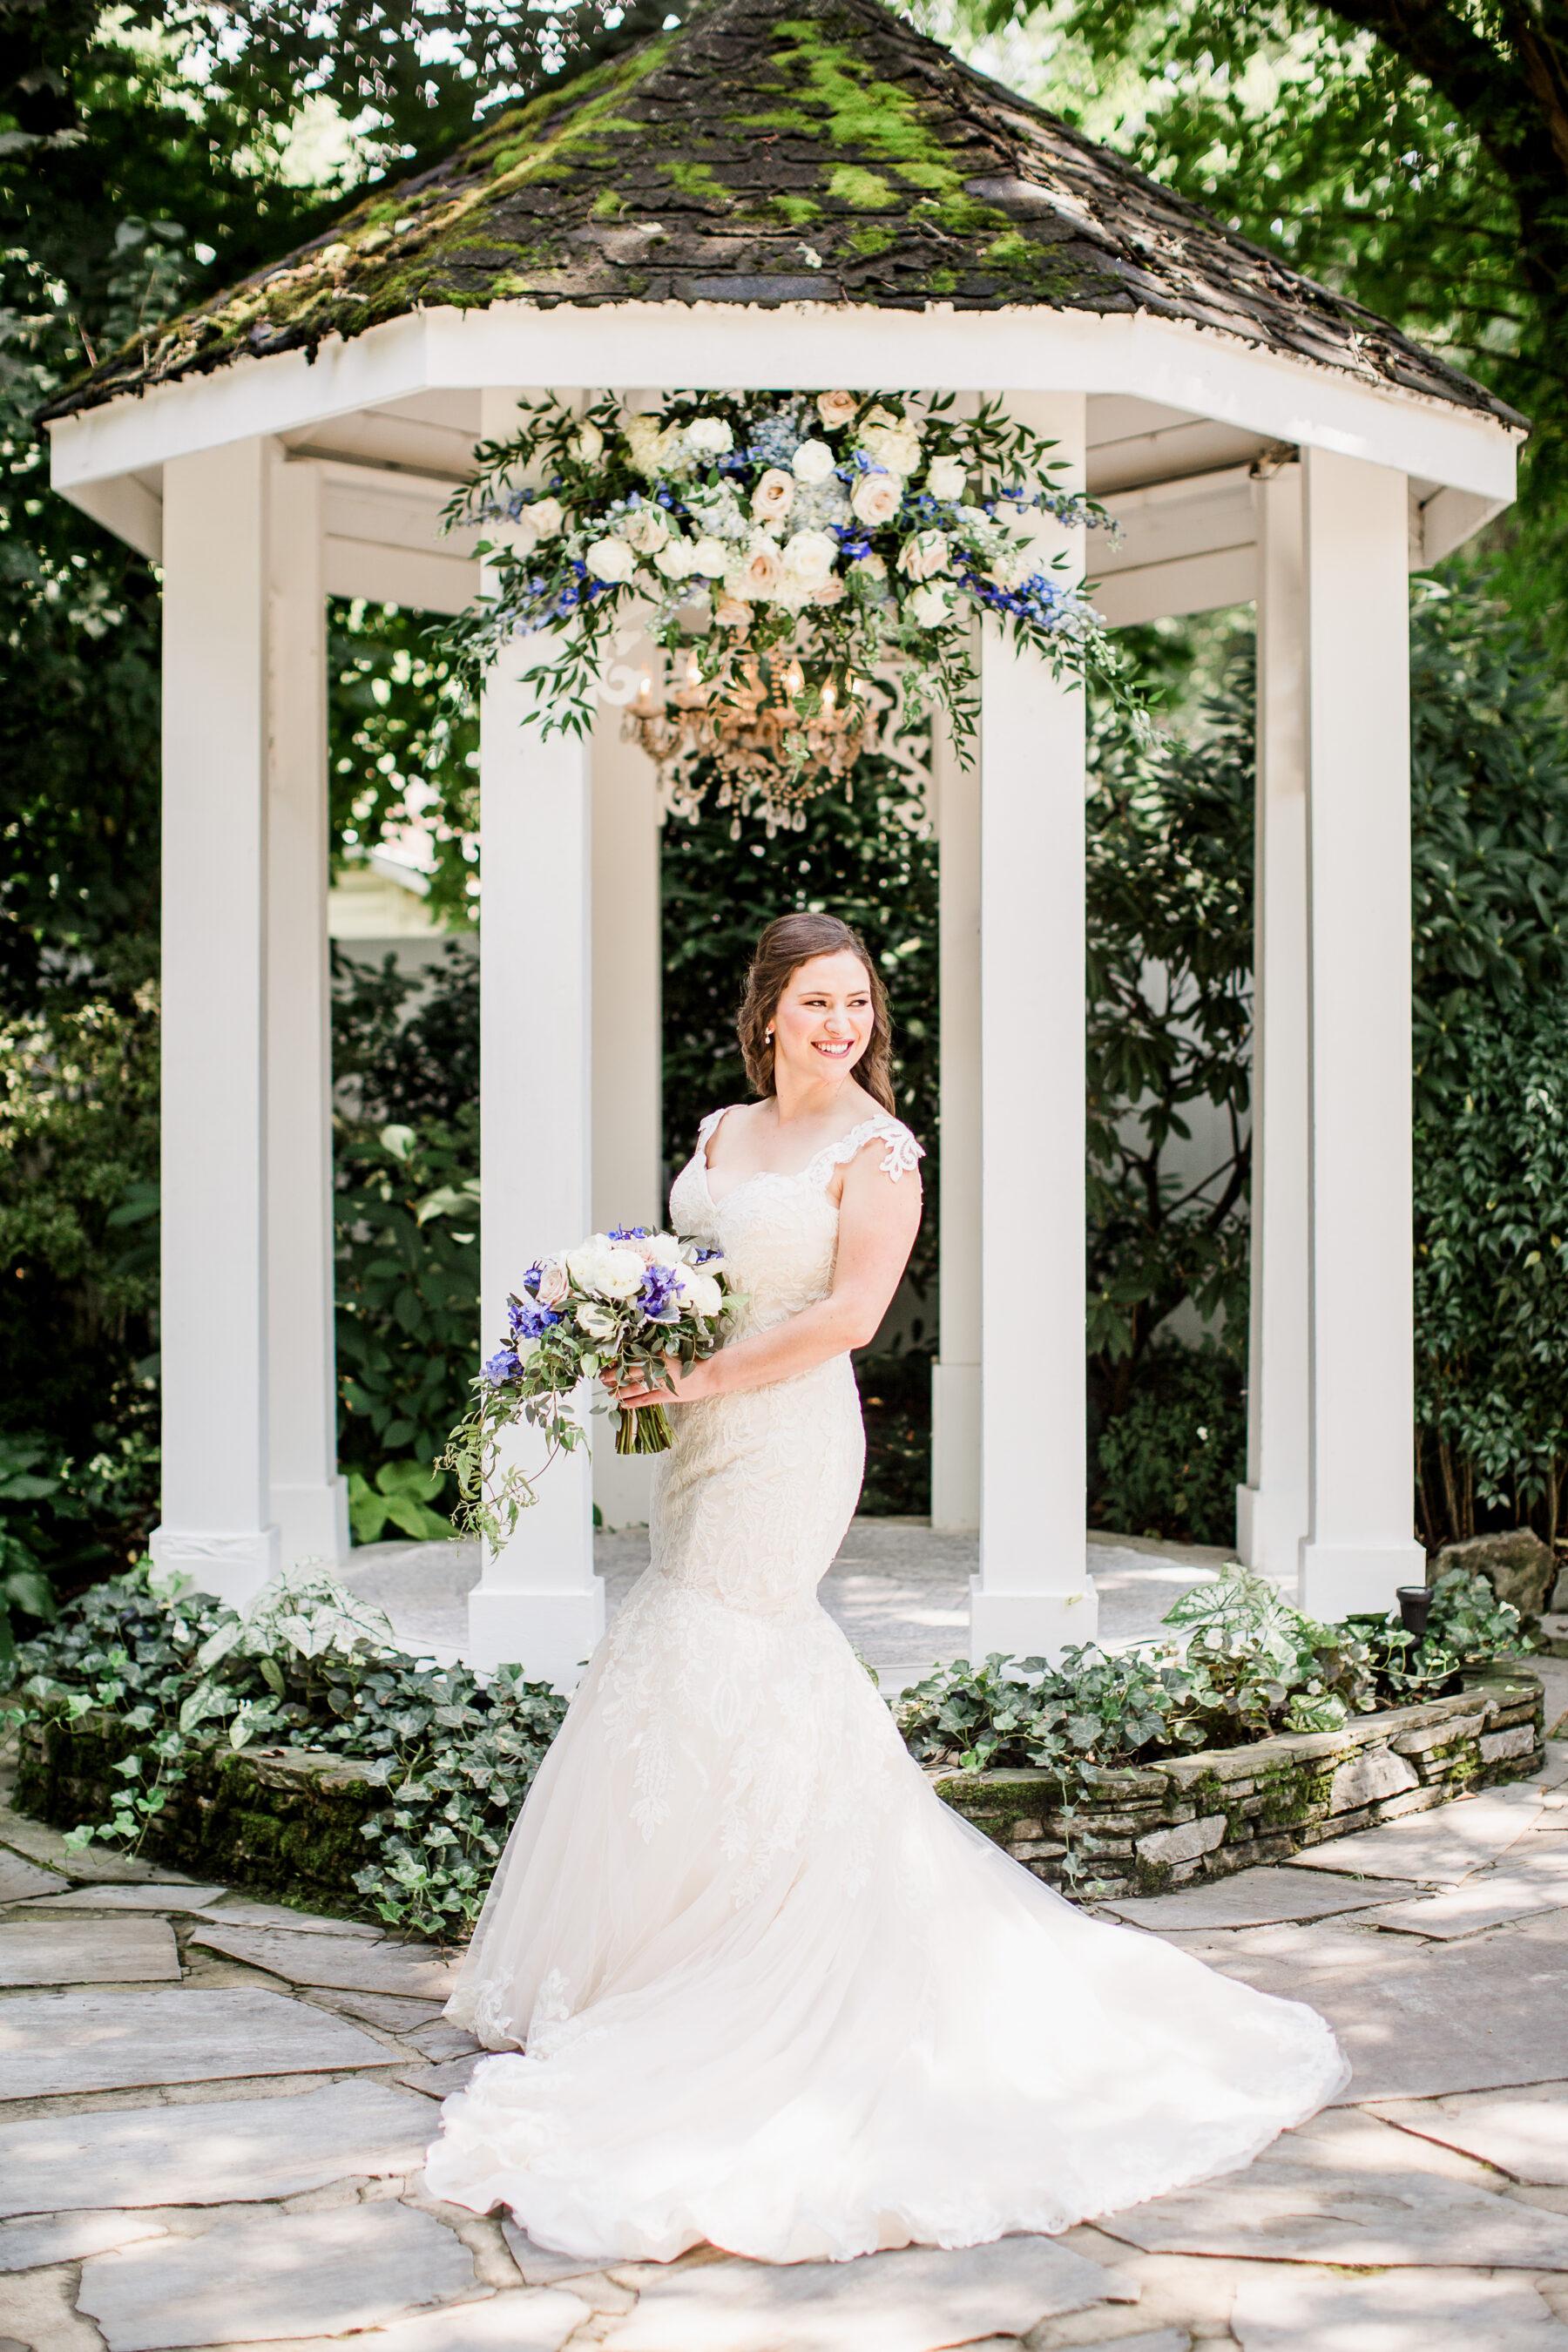 CJ's Off the Square Garden wedding | Nashville Bride Guide